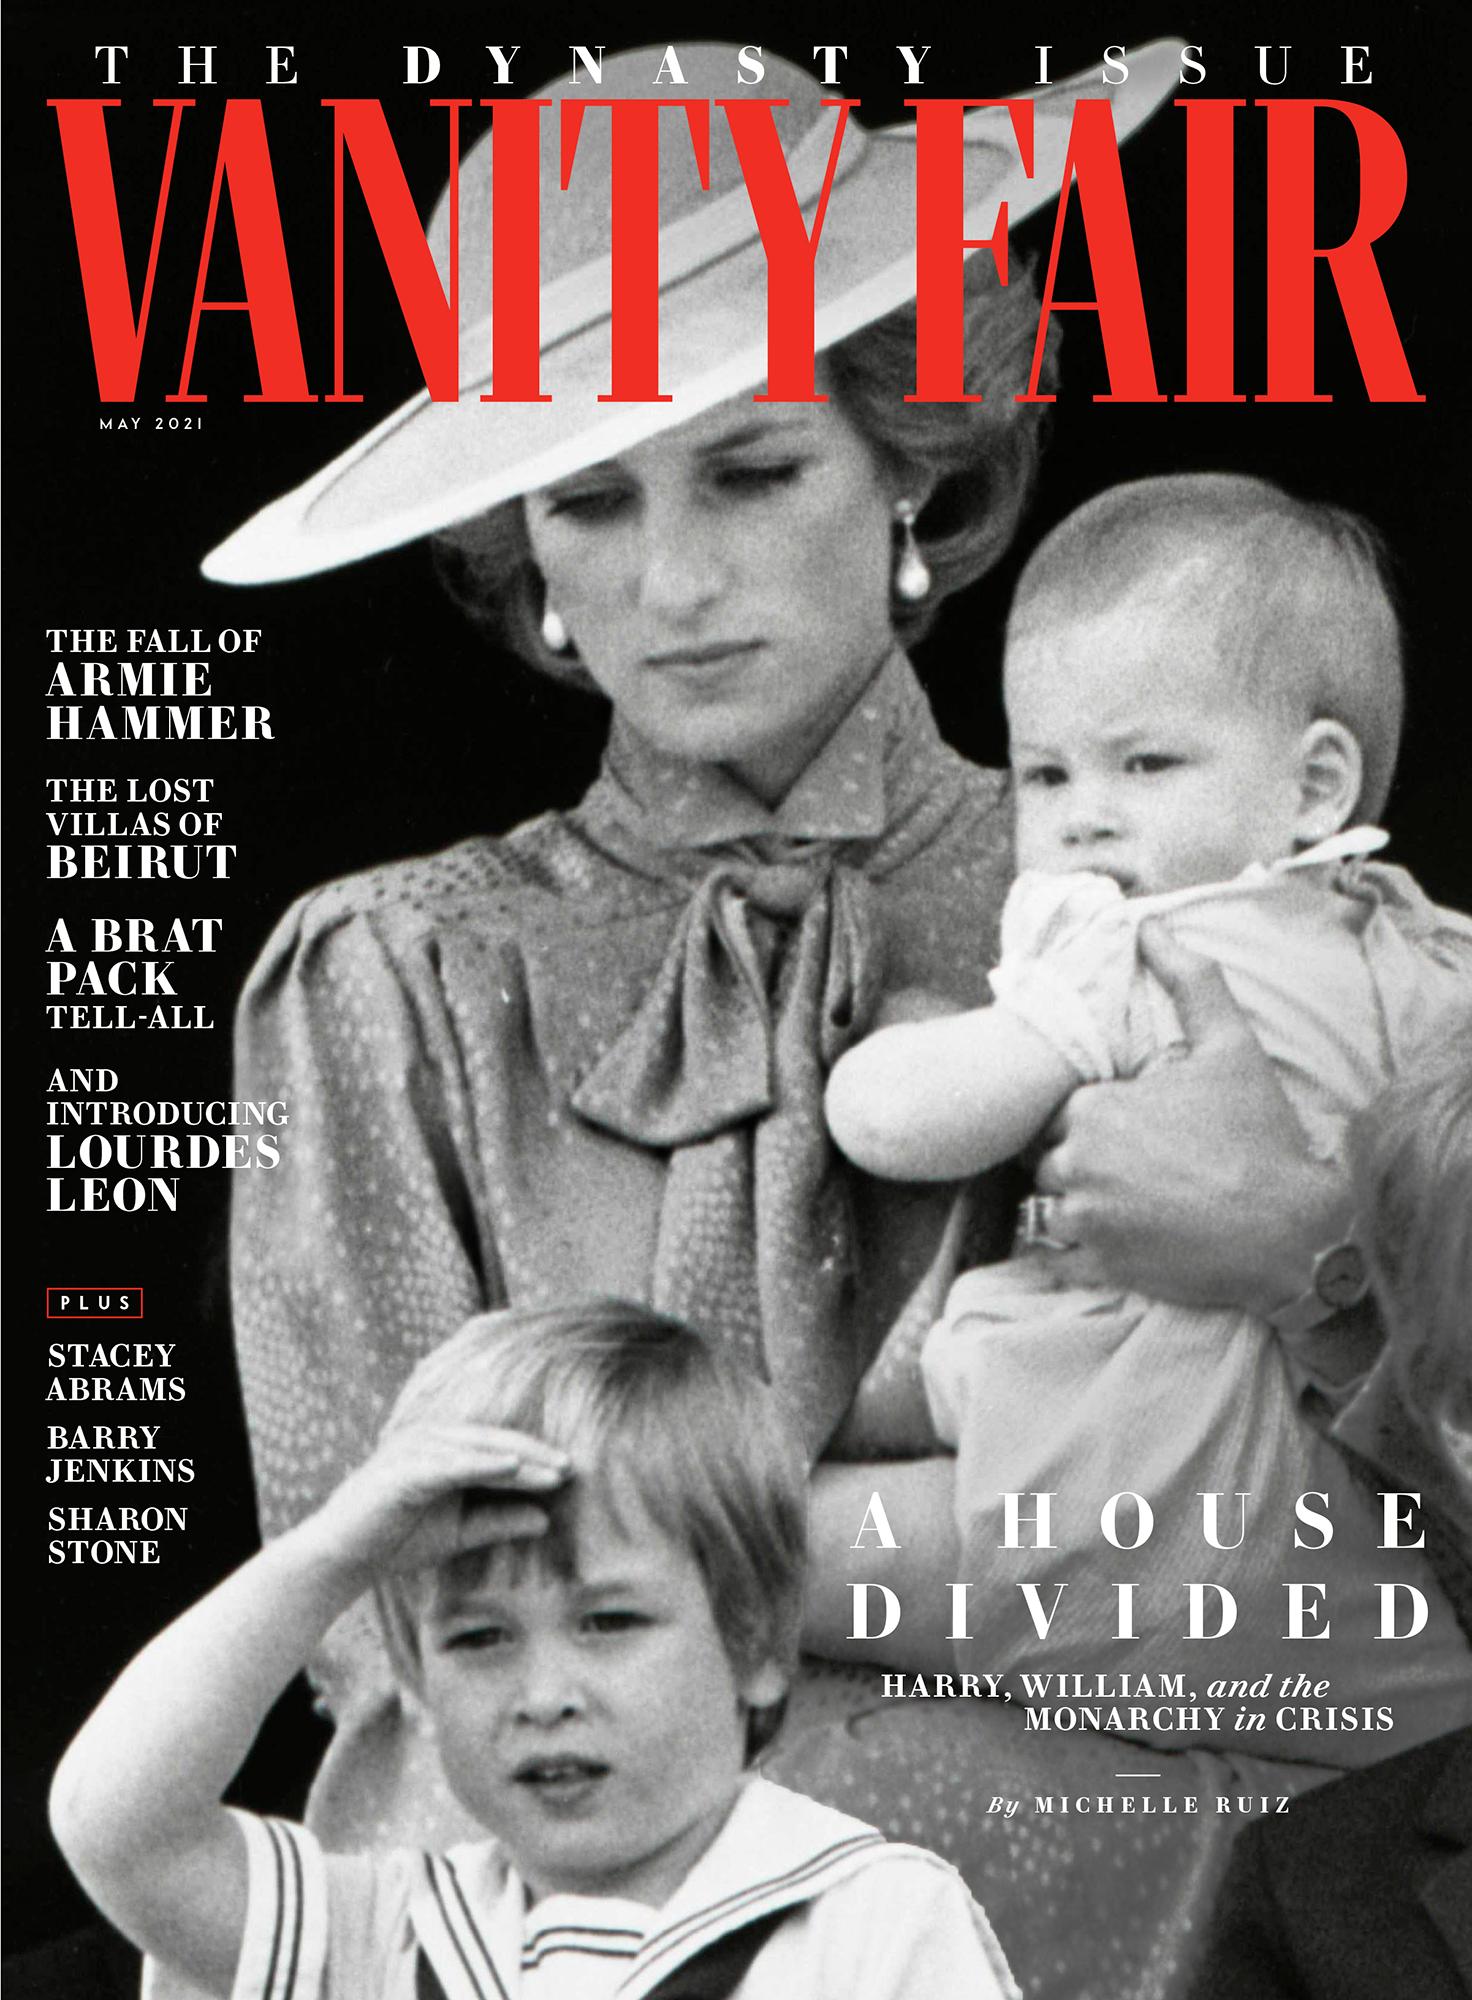 vanity fair frontpage